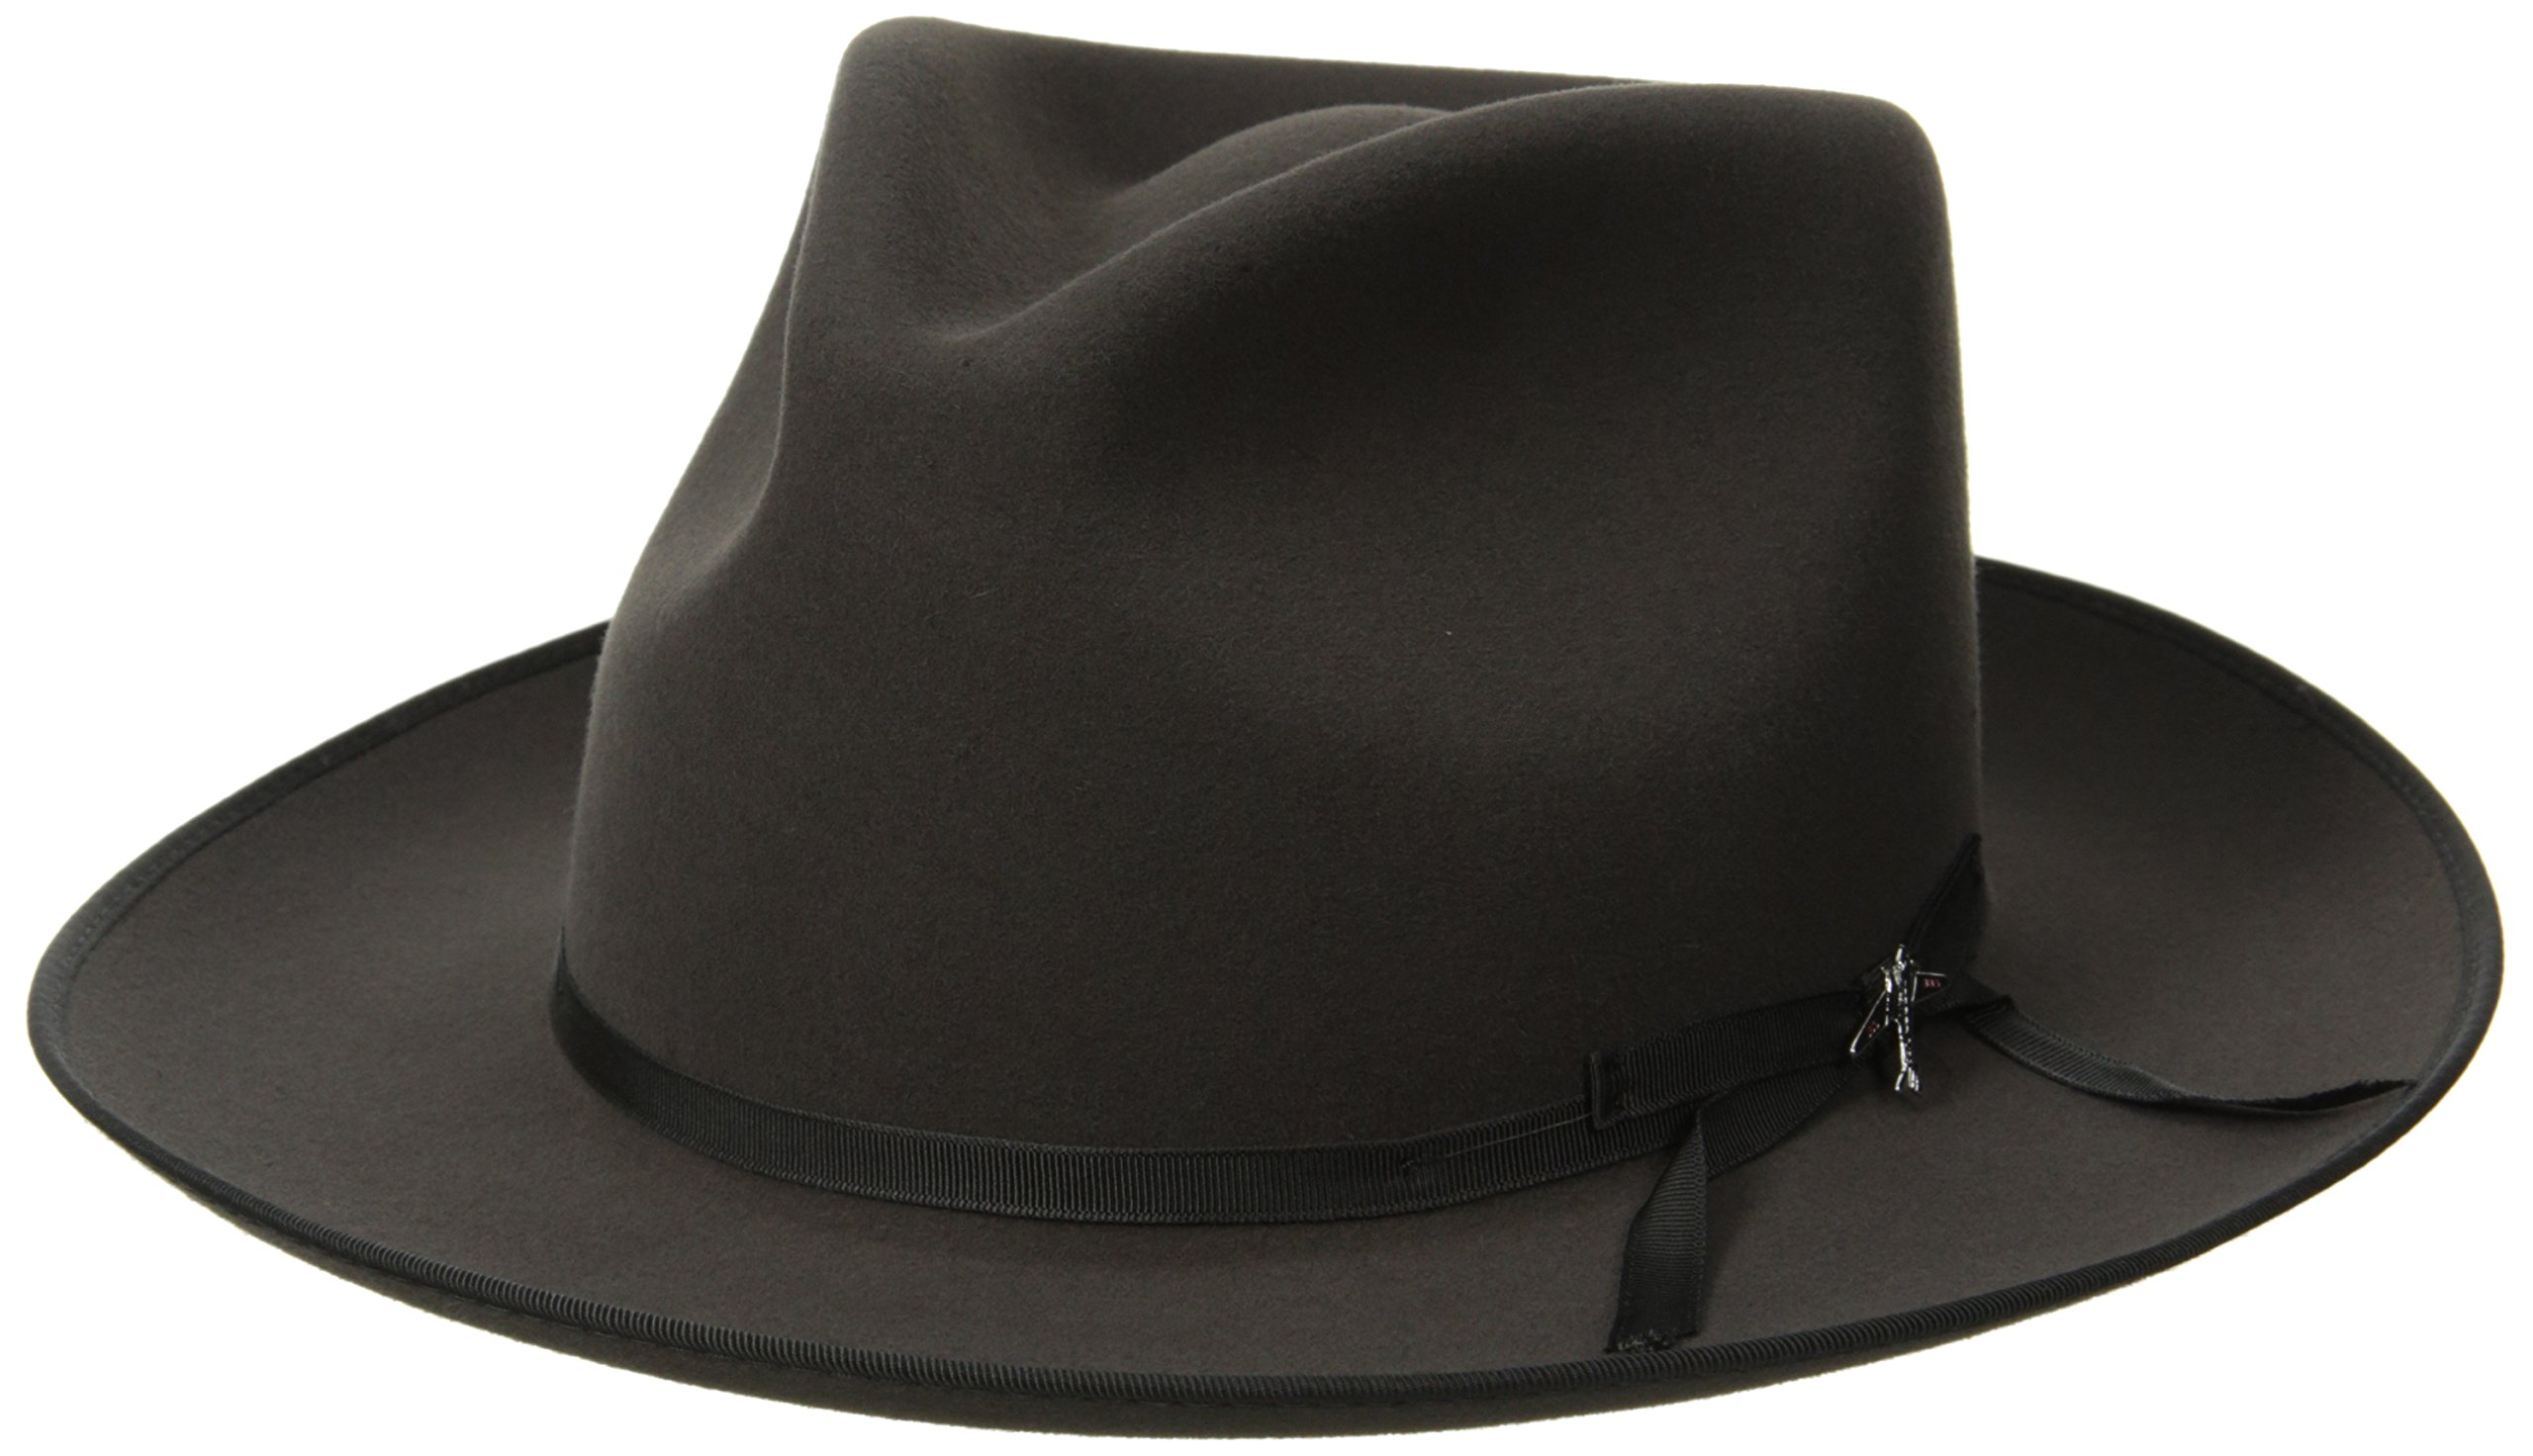 Stetson Men's Stratoliner Roayl Quality Fur Felt Hat, Caribou, 7.375